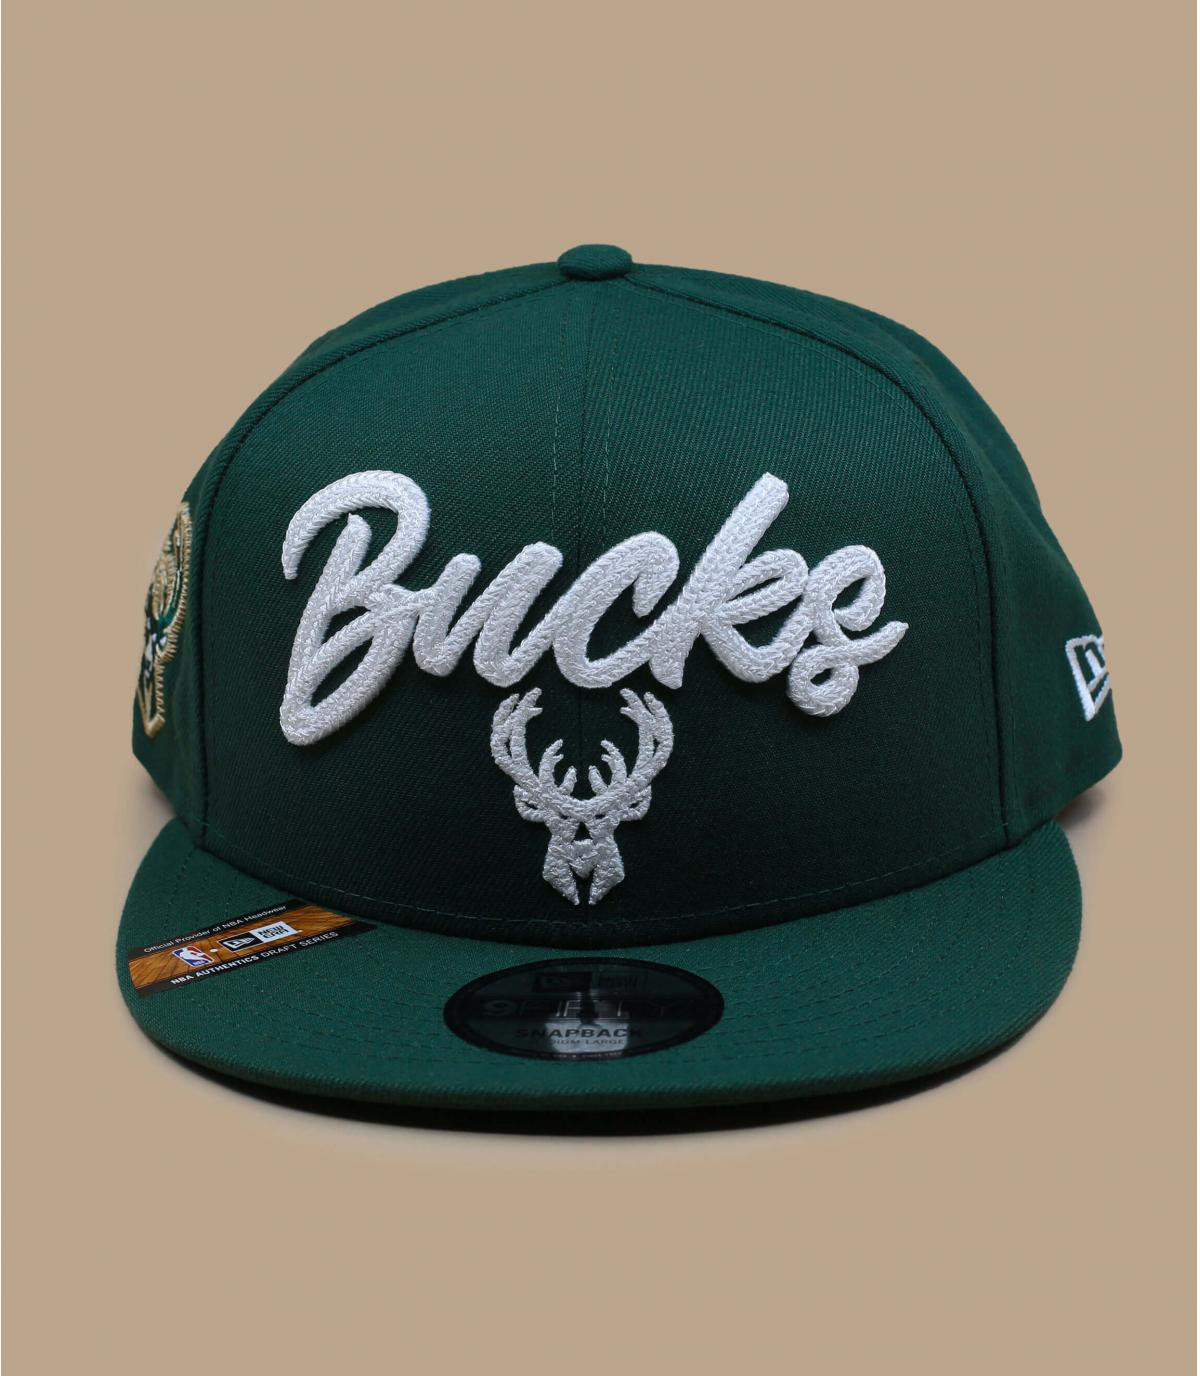 Details Snapback NBA Draft Bucks  950 - Abbildung 2